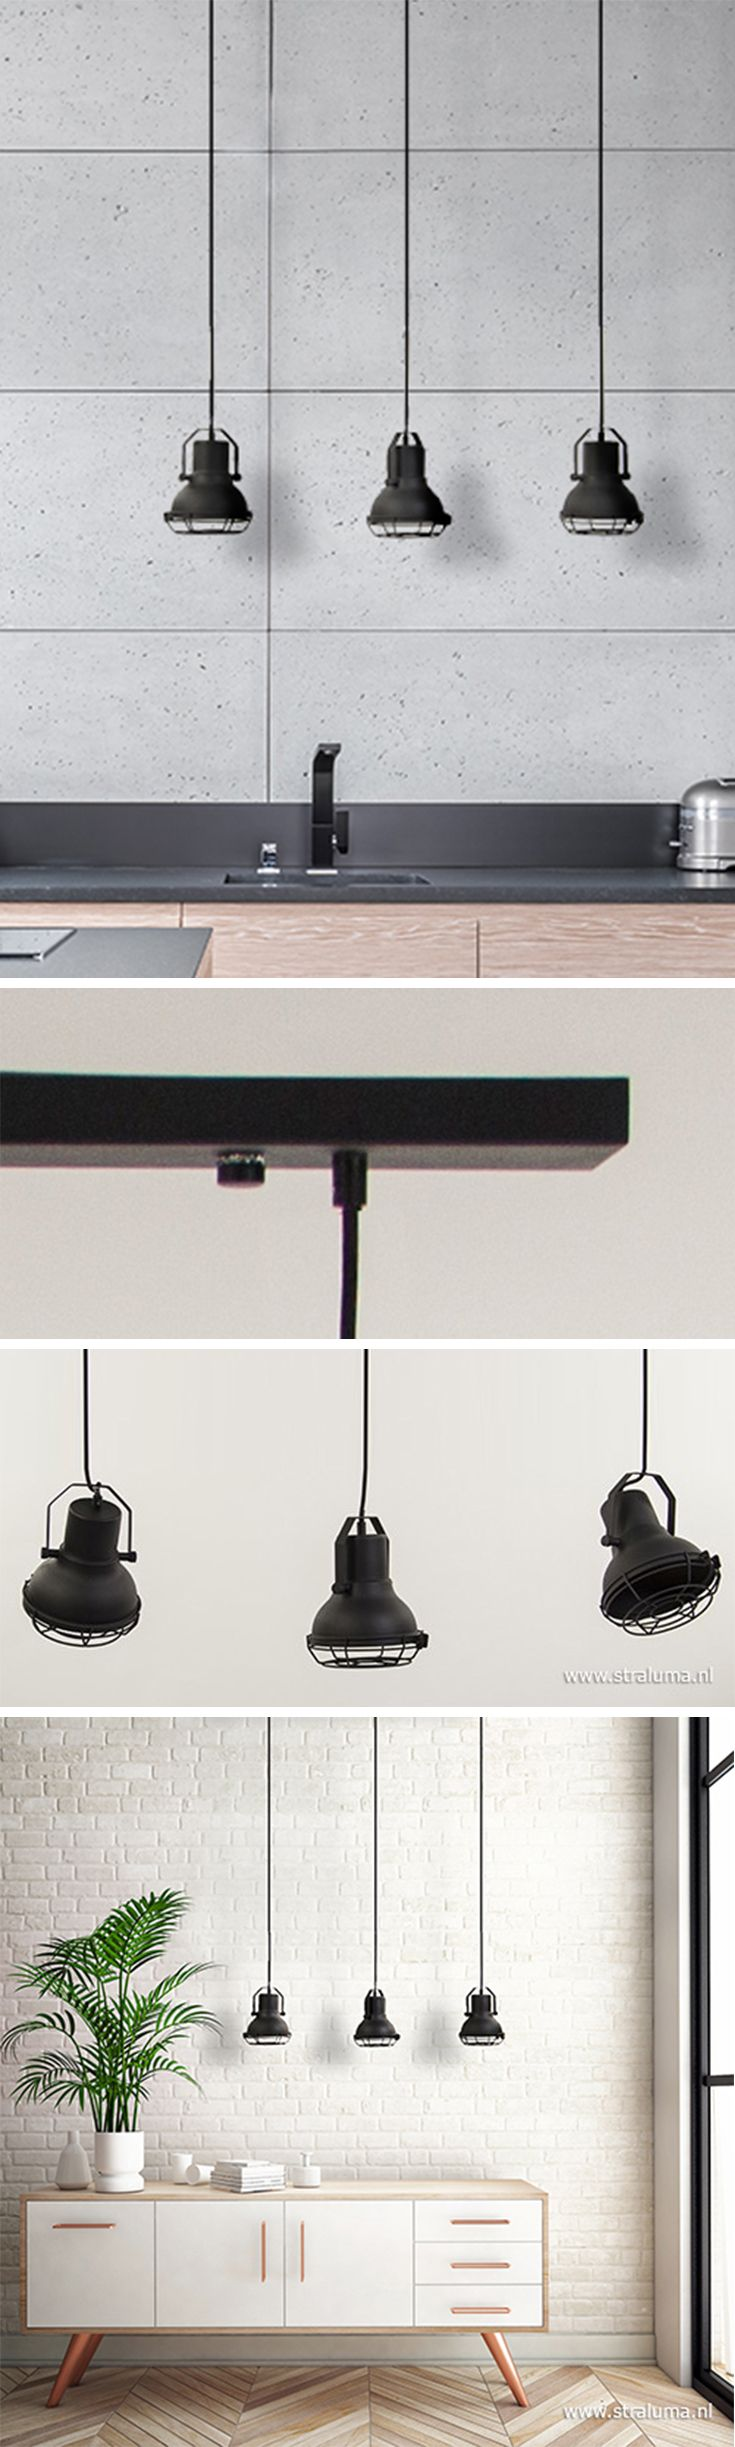 Super Hanglamp Boven Aanrecht. Interesting Tafel Keuken Hanglamp #WT81